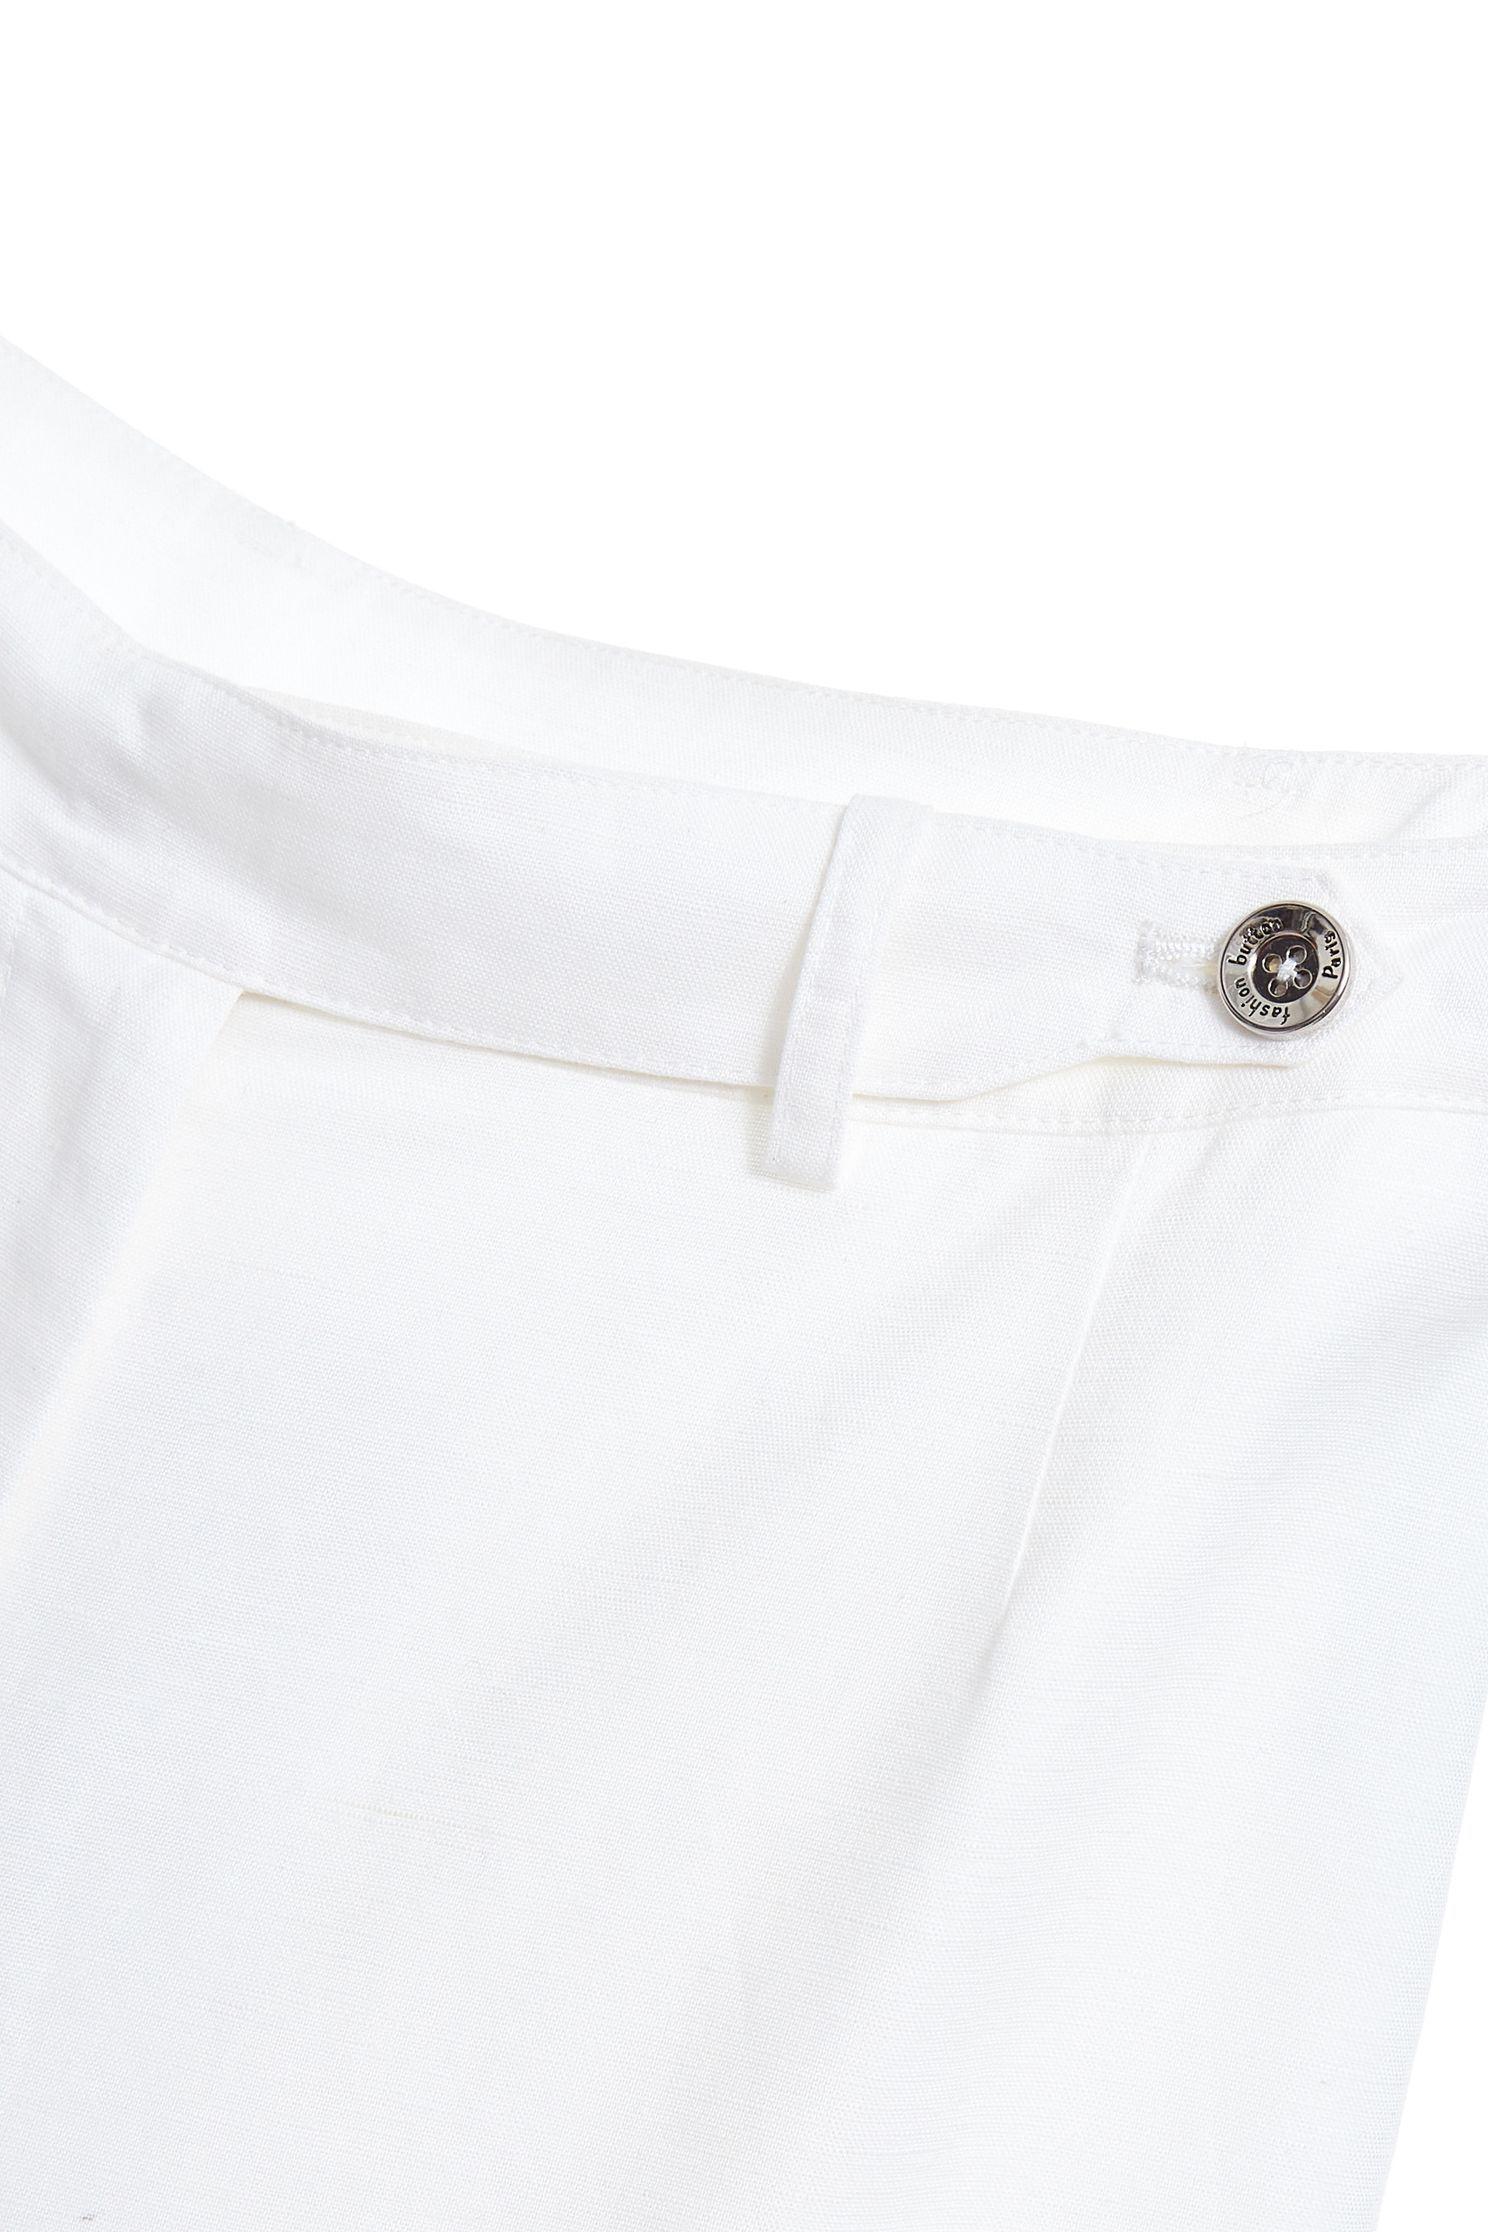 Lace stitching popular culottes,Culottes Pants,白色褲子,白色長褲,Lace,Pants,長褲,Was thin